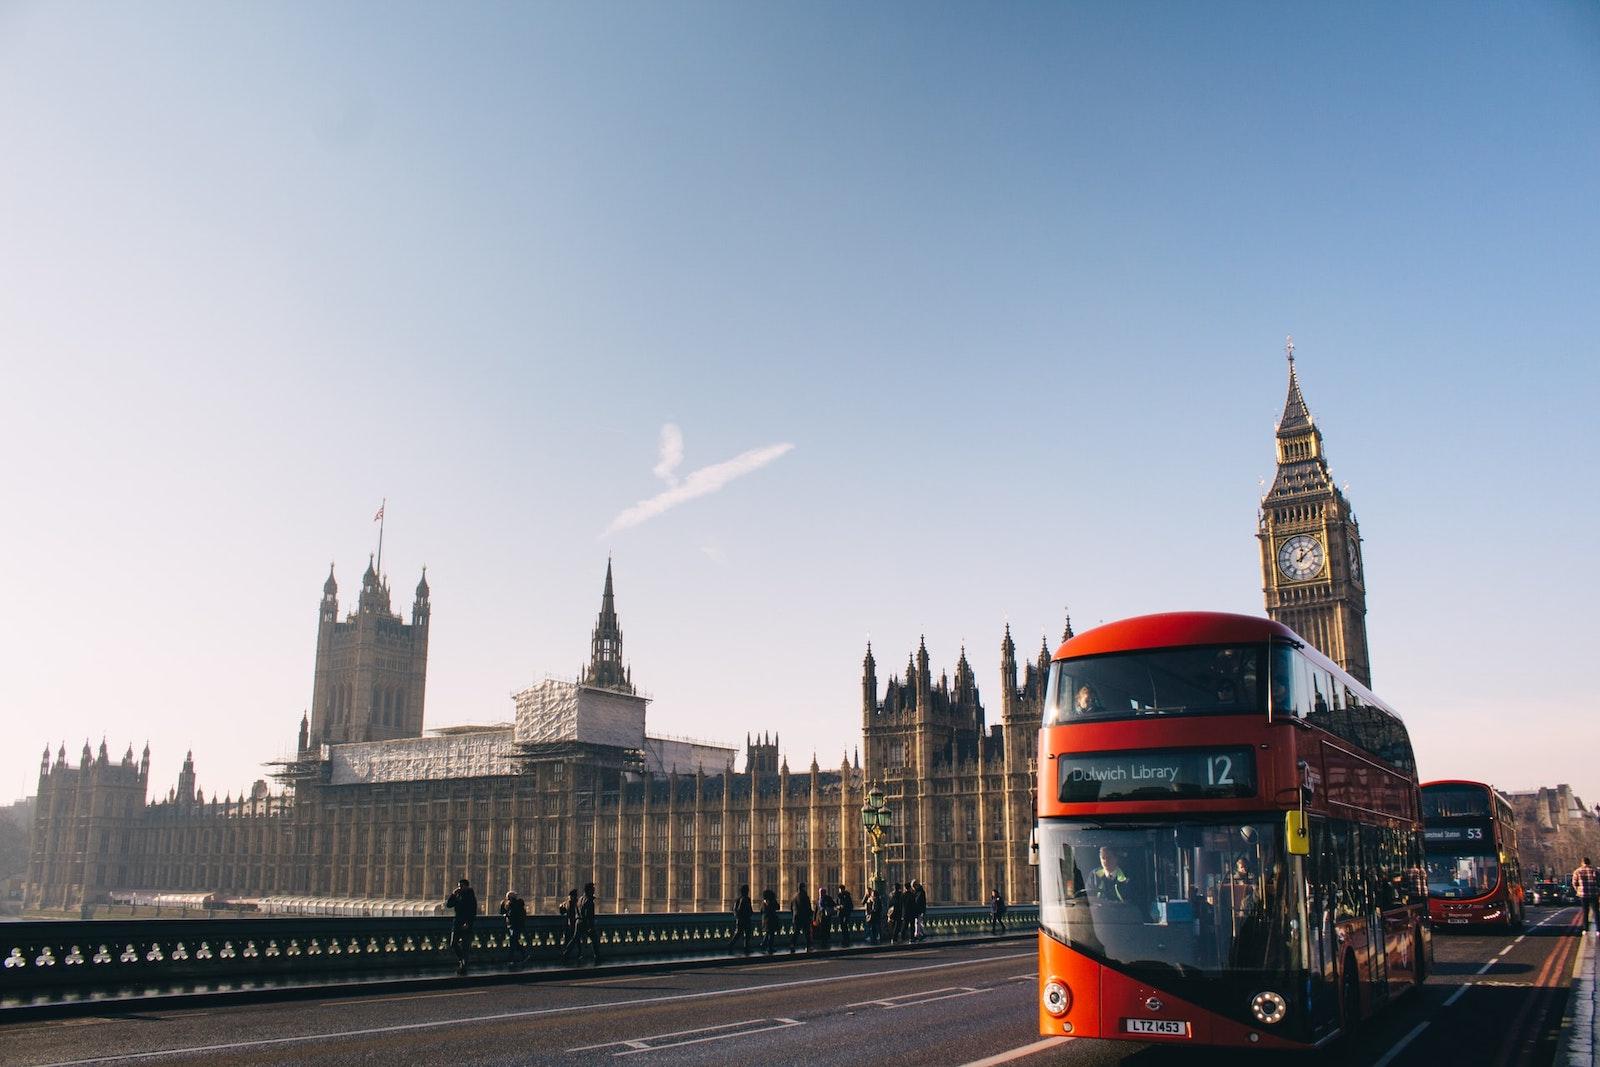 Living in Bloomsbury - Travelling by Bus